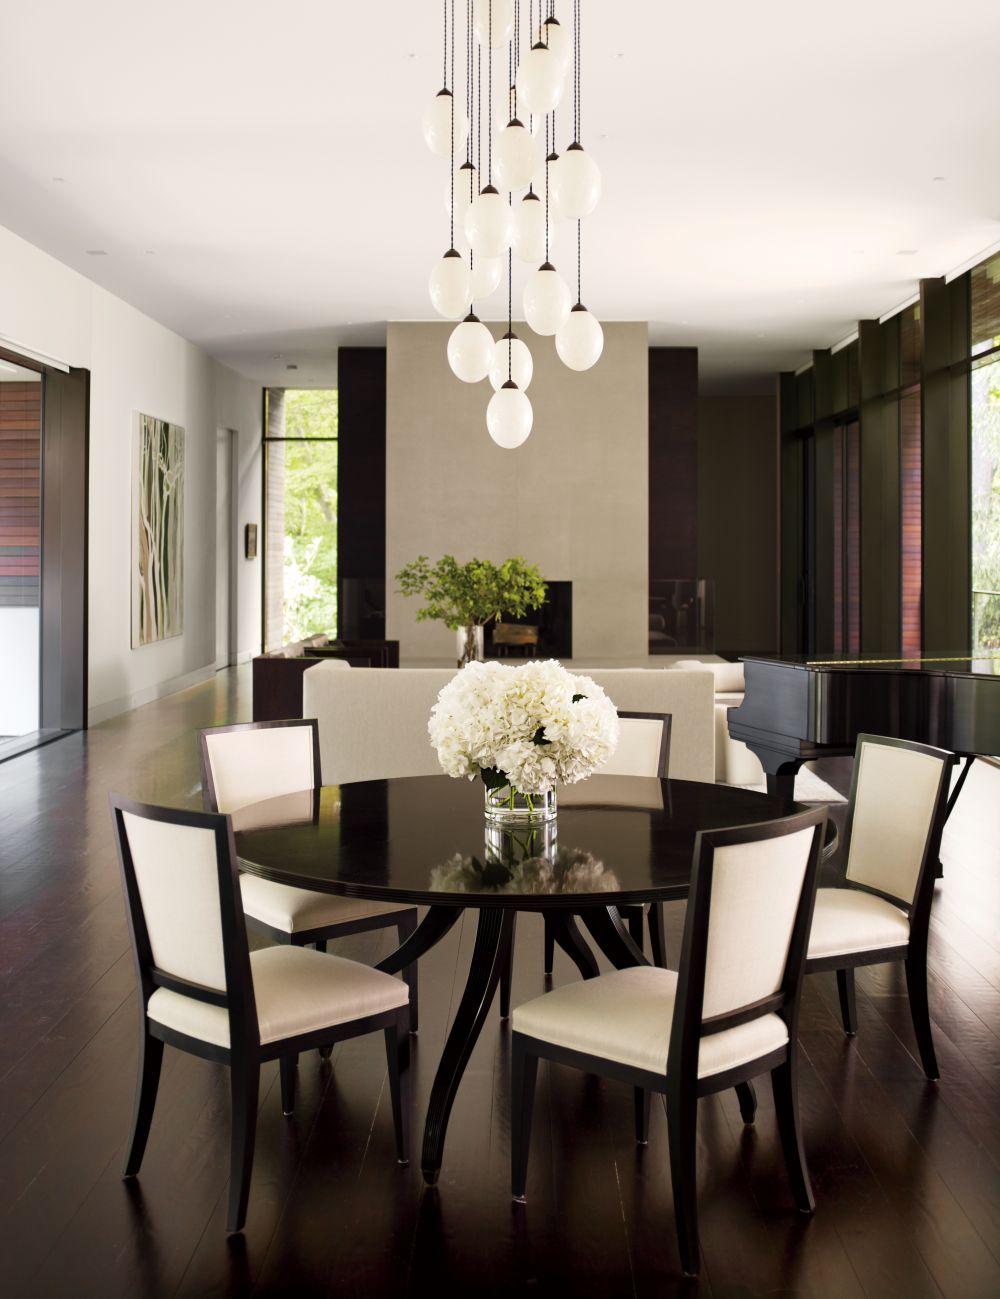 Modern Dining Room photo - 7